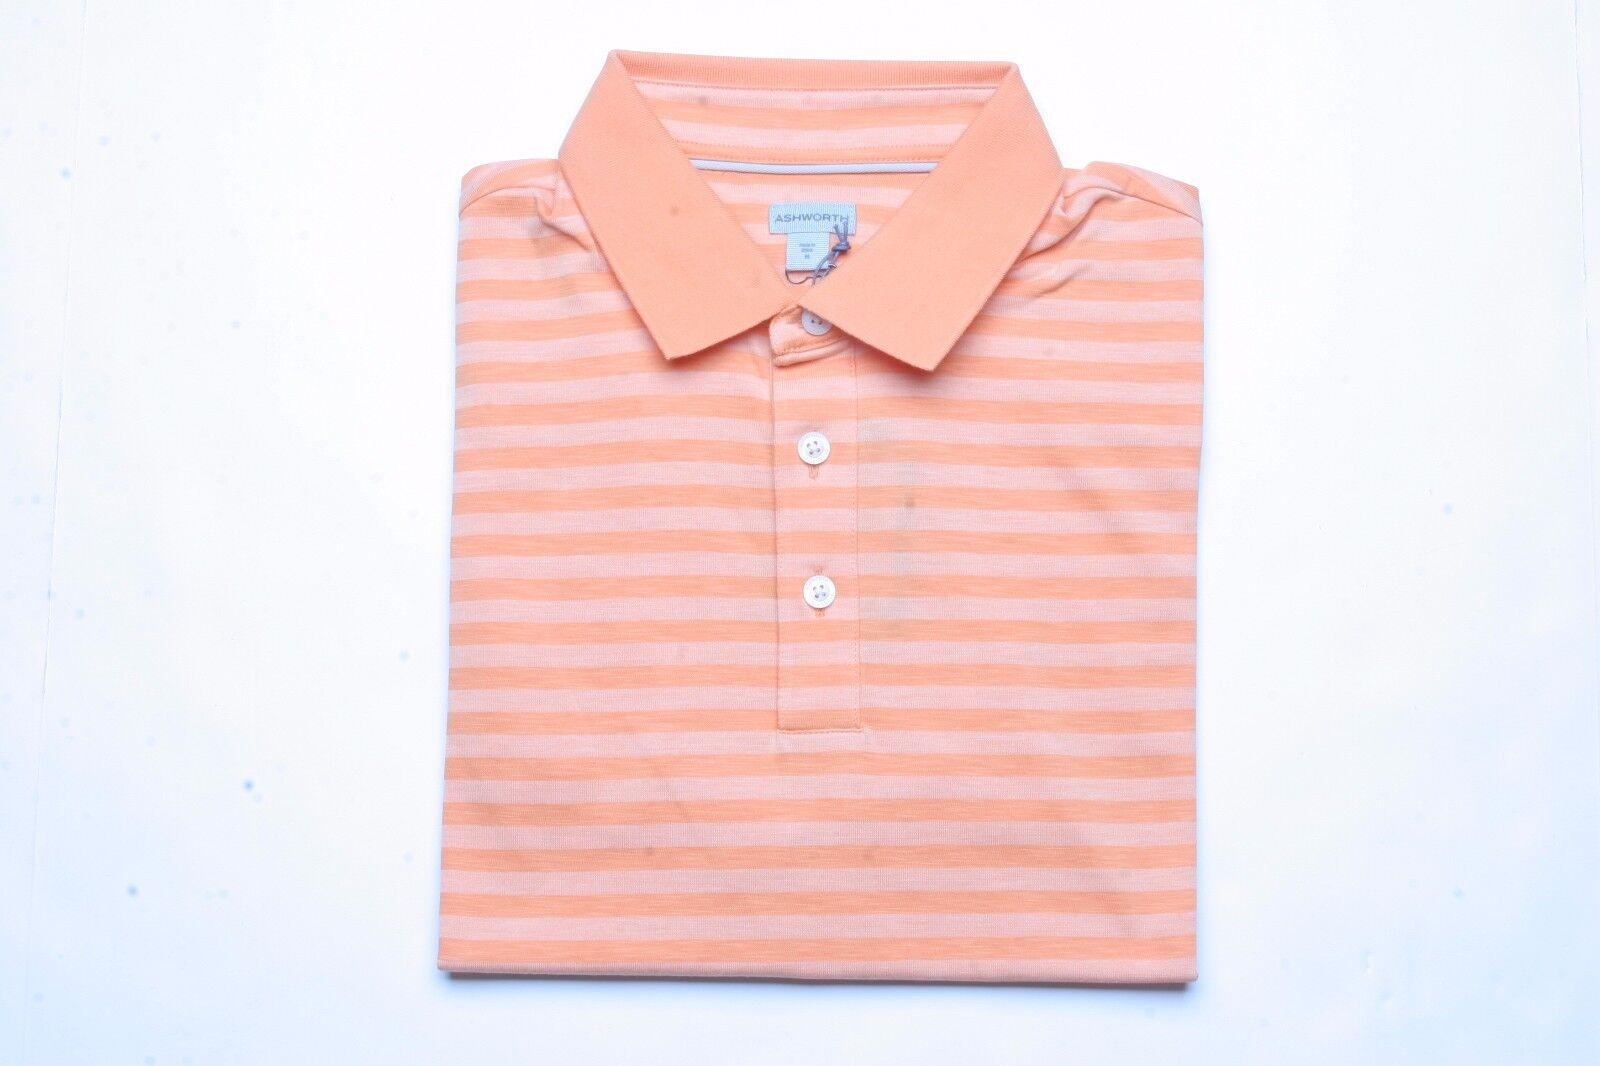 Ashworth Striped Short Sleeve Polo Shirt (M) AE4871 Sunset